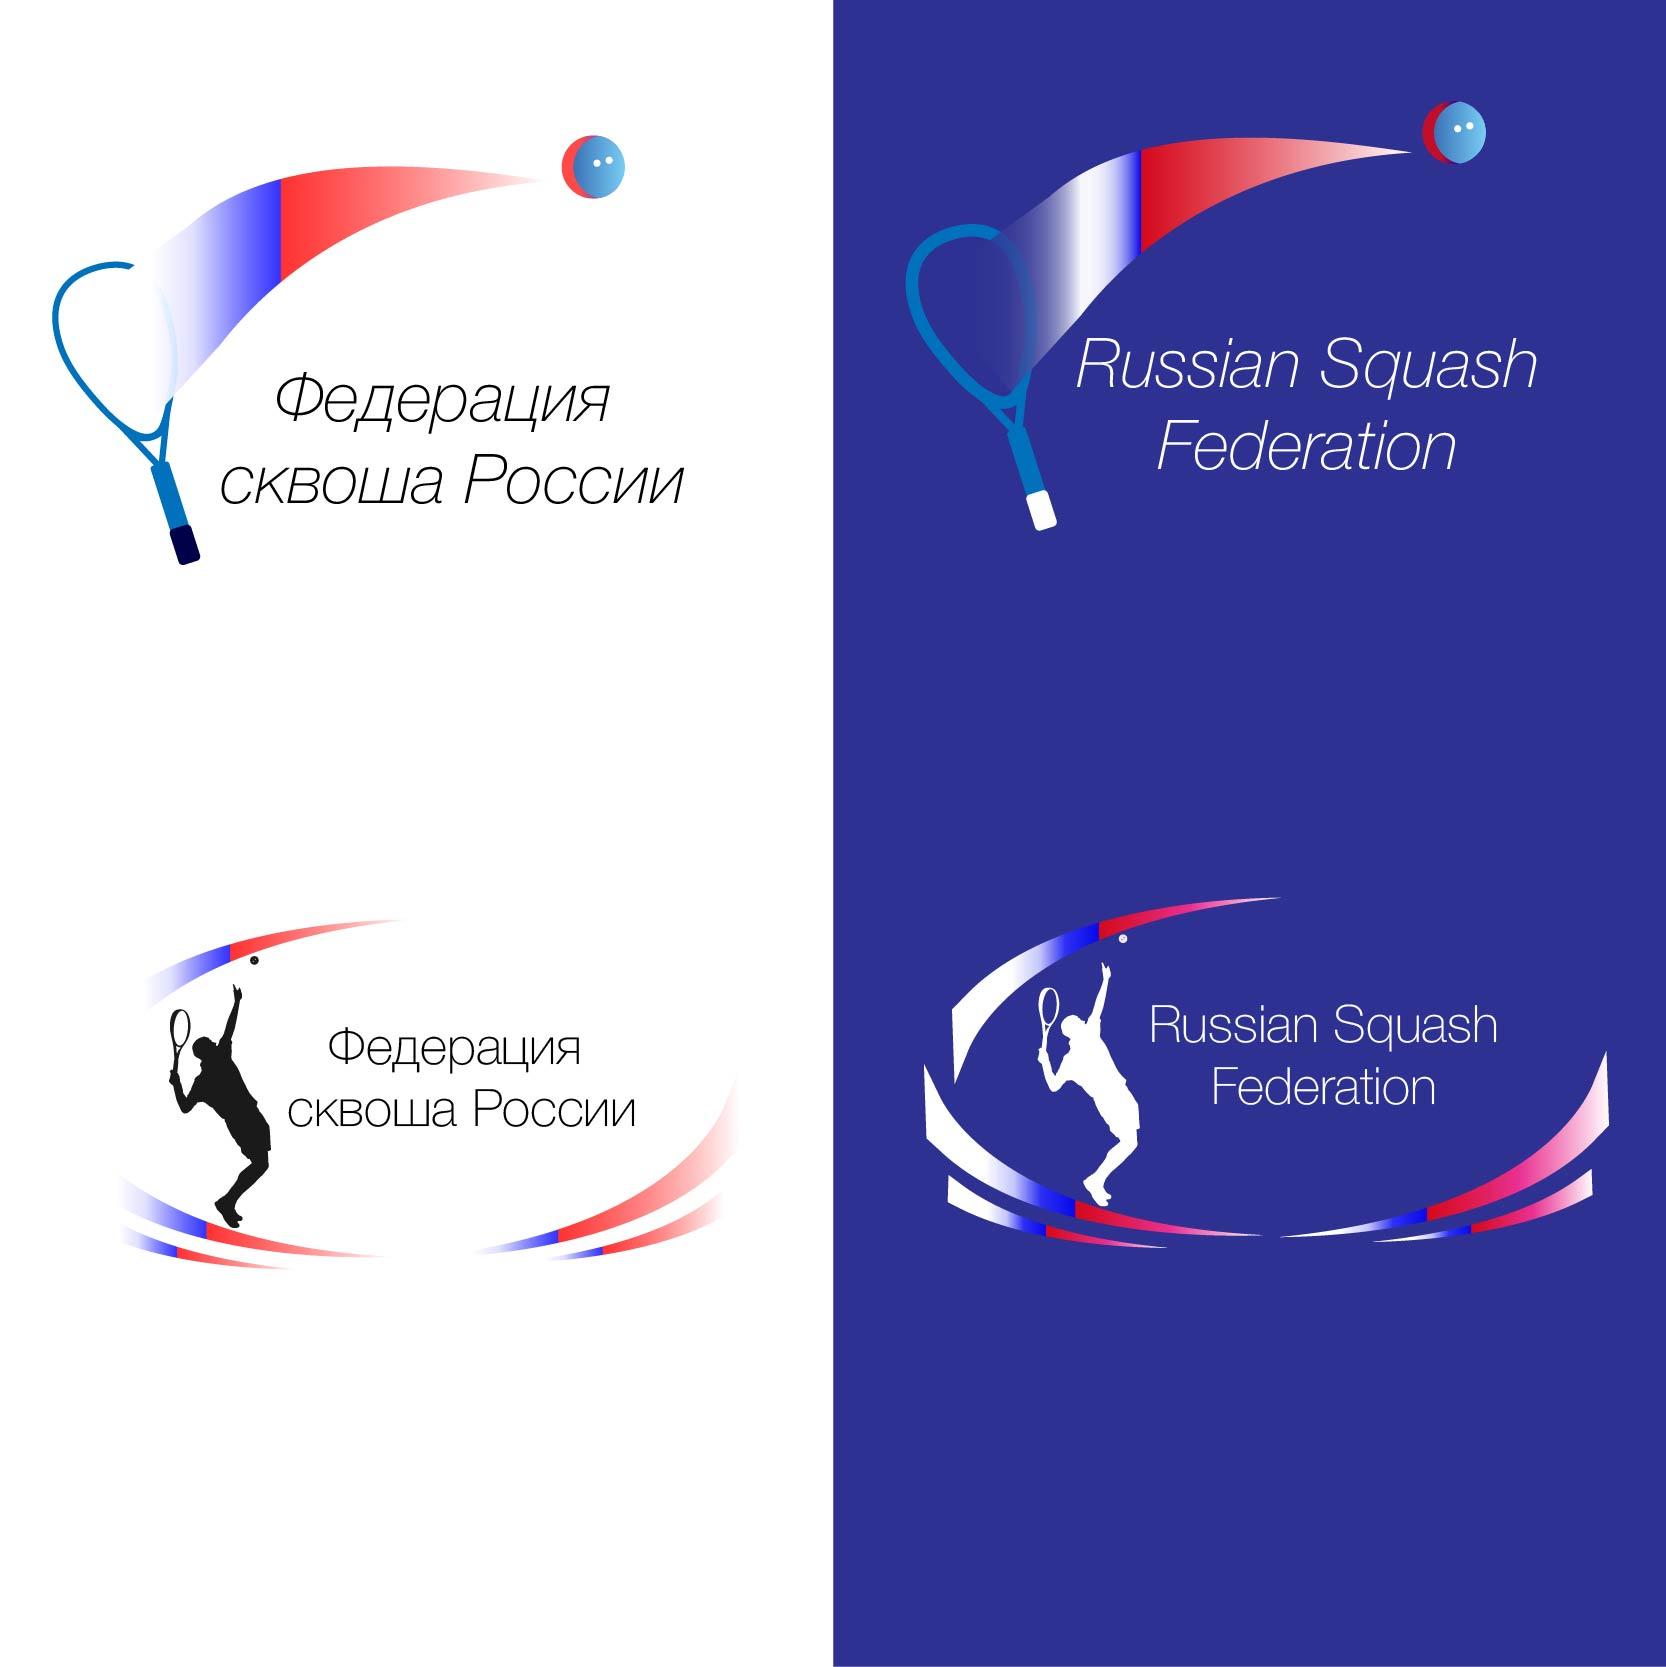 Разработать логотип для Федерации сквоша России фото f_6325f328a66e3aed.jpg